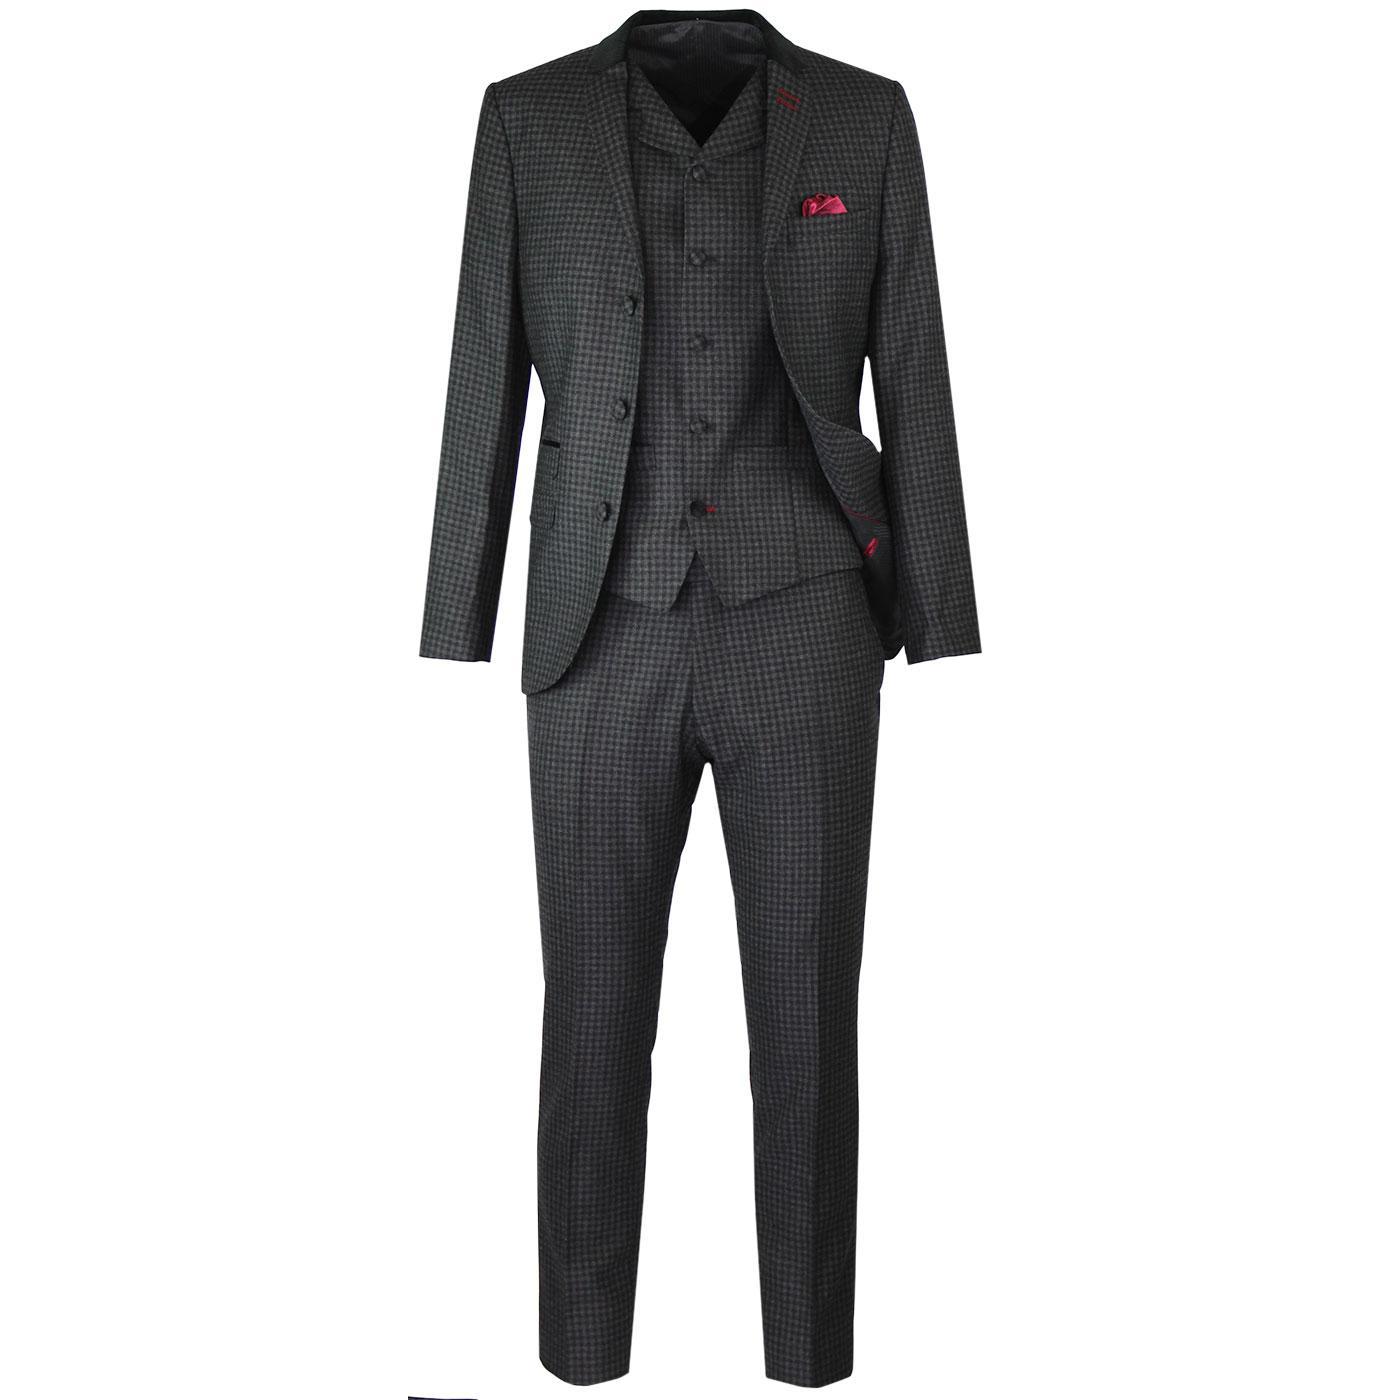 MADCAP ENGLAND Cord Collar Gingham Check Mod Suit